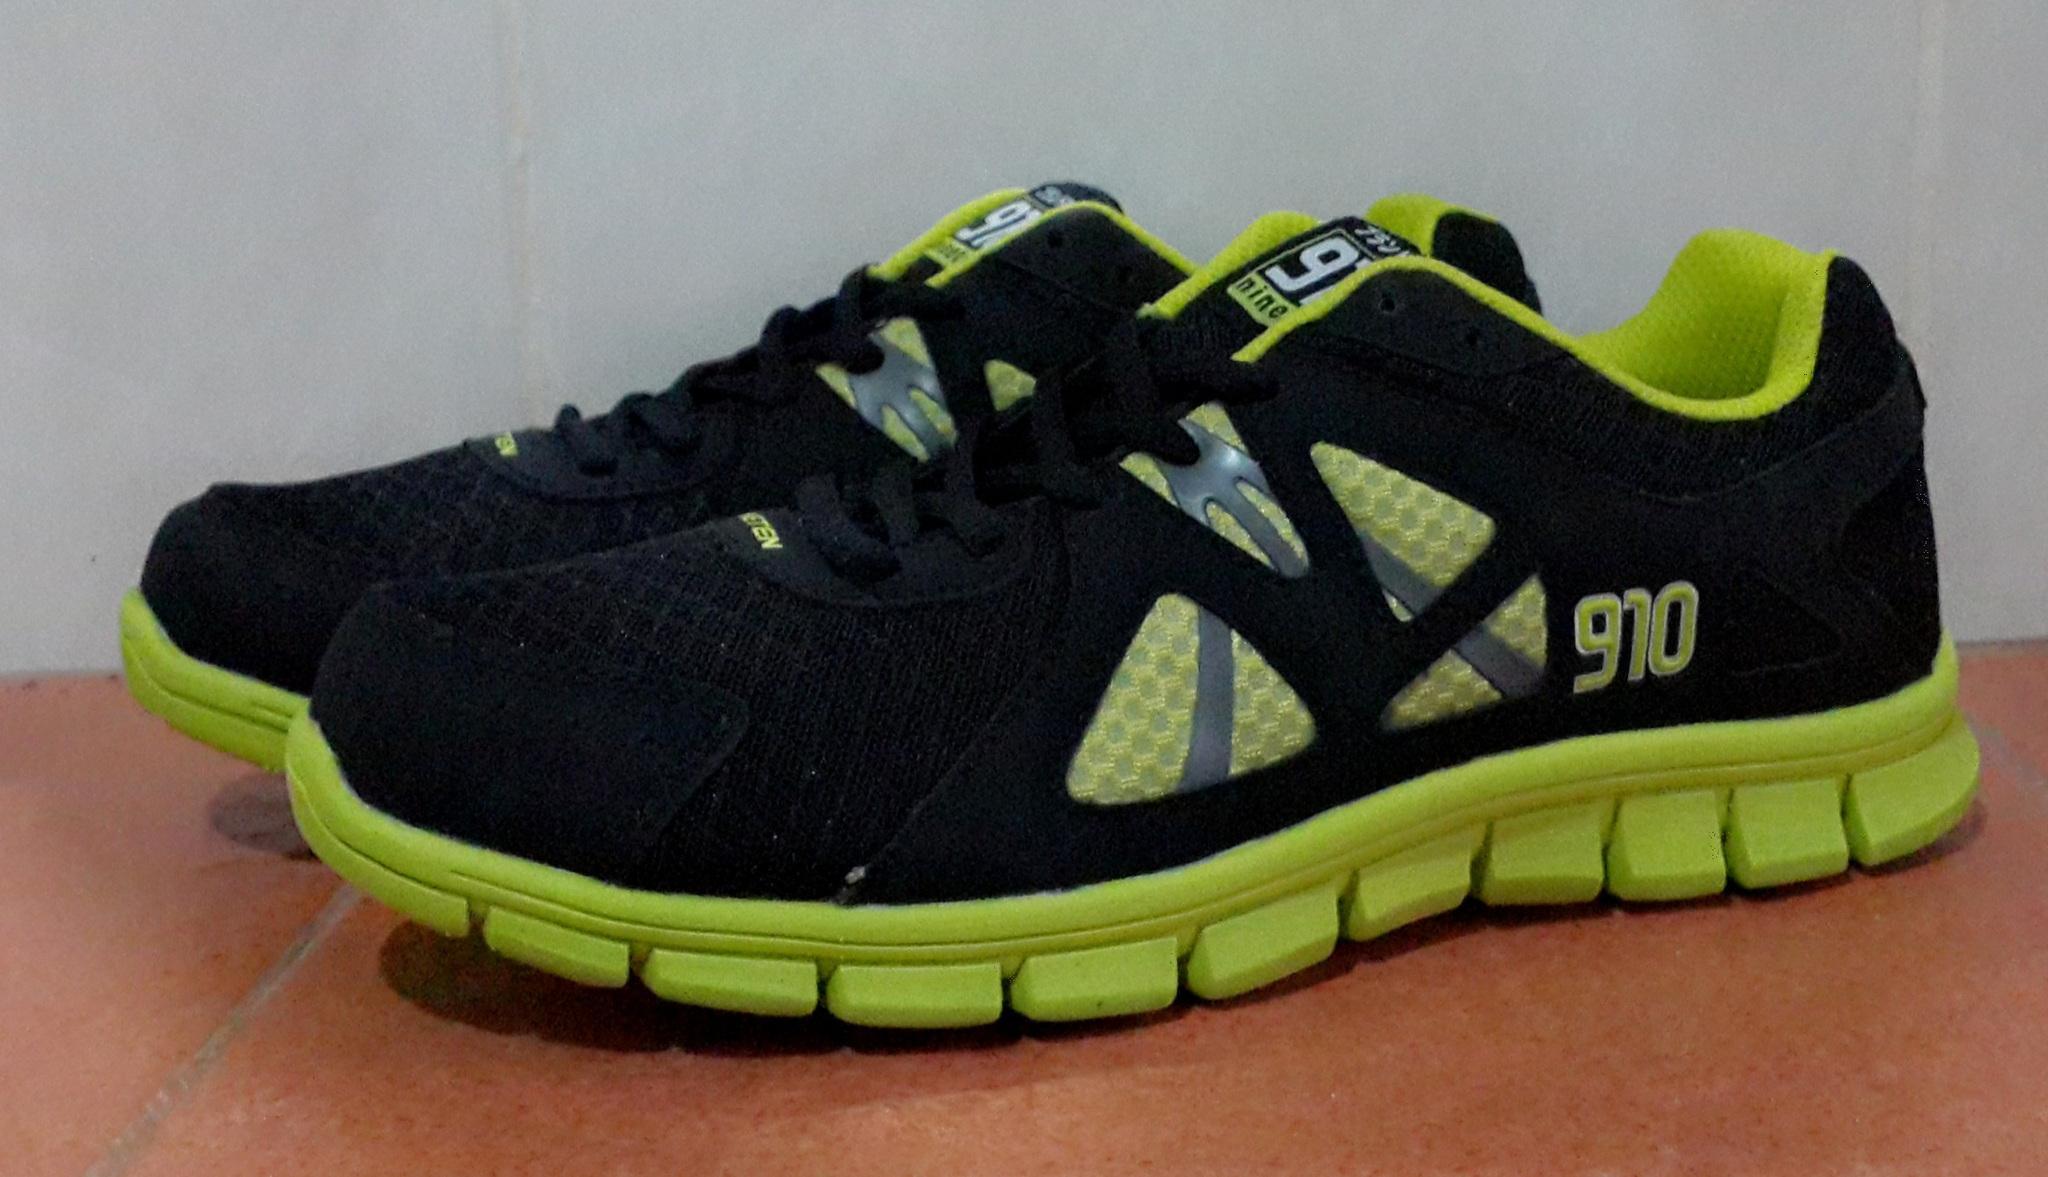 Jual Sepatu Olahraga Nineten (910) Furema - toko ridho baru ... 02e51fc2d2